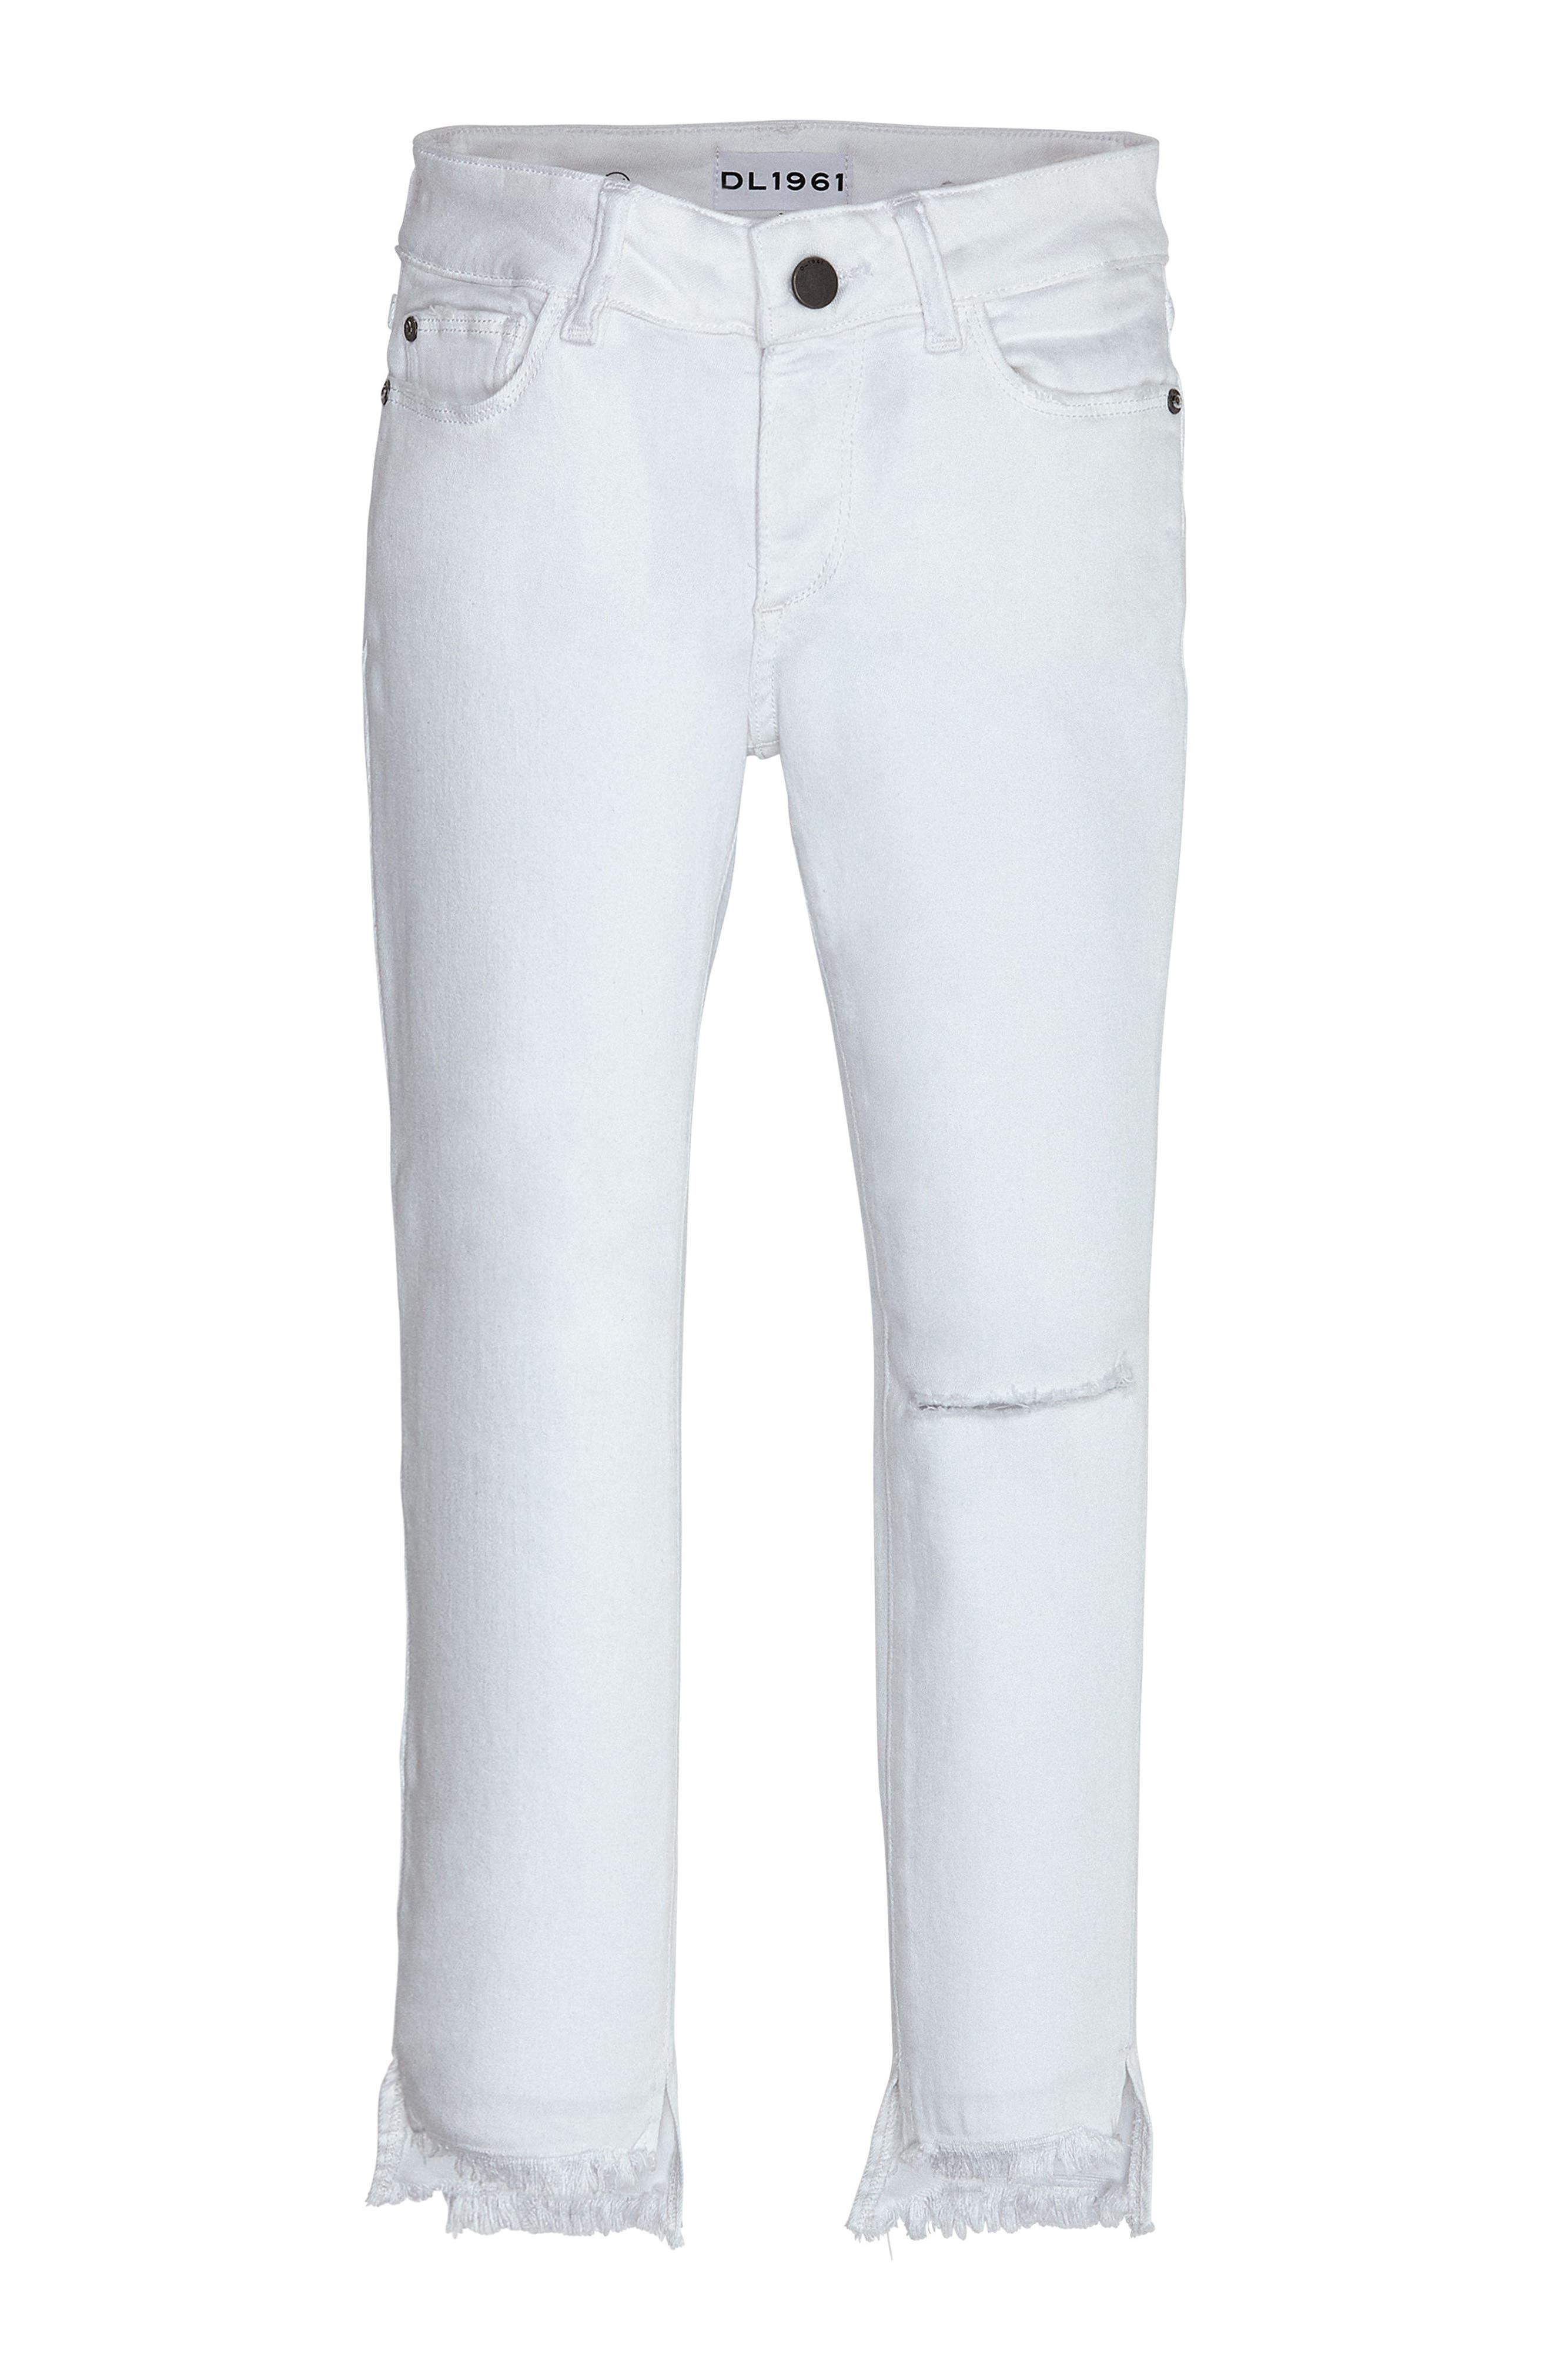 DL1961 Distressed Skinny Jeans (Big Girls)